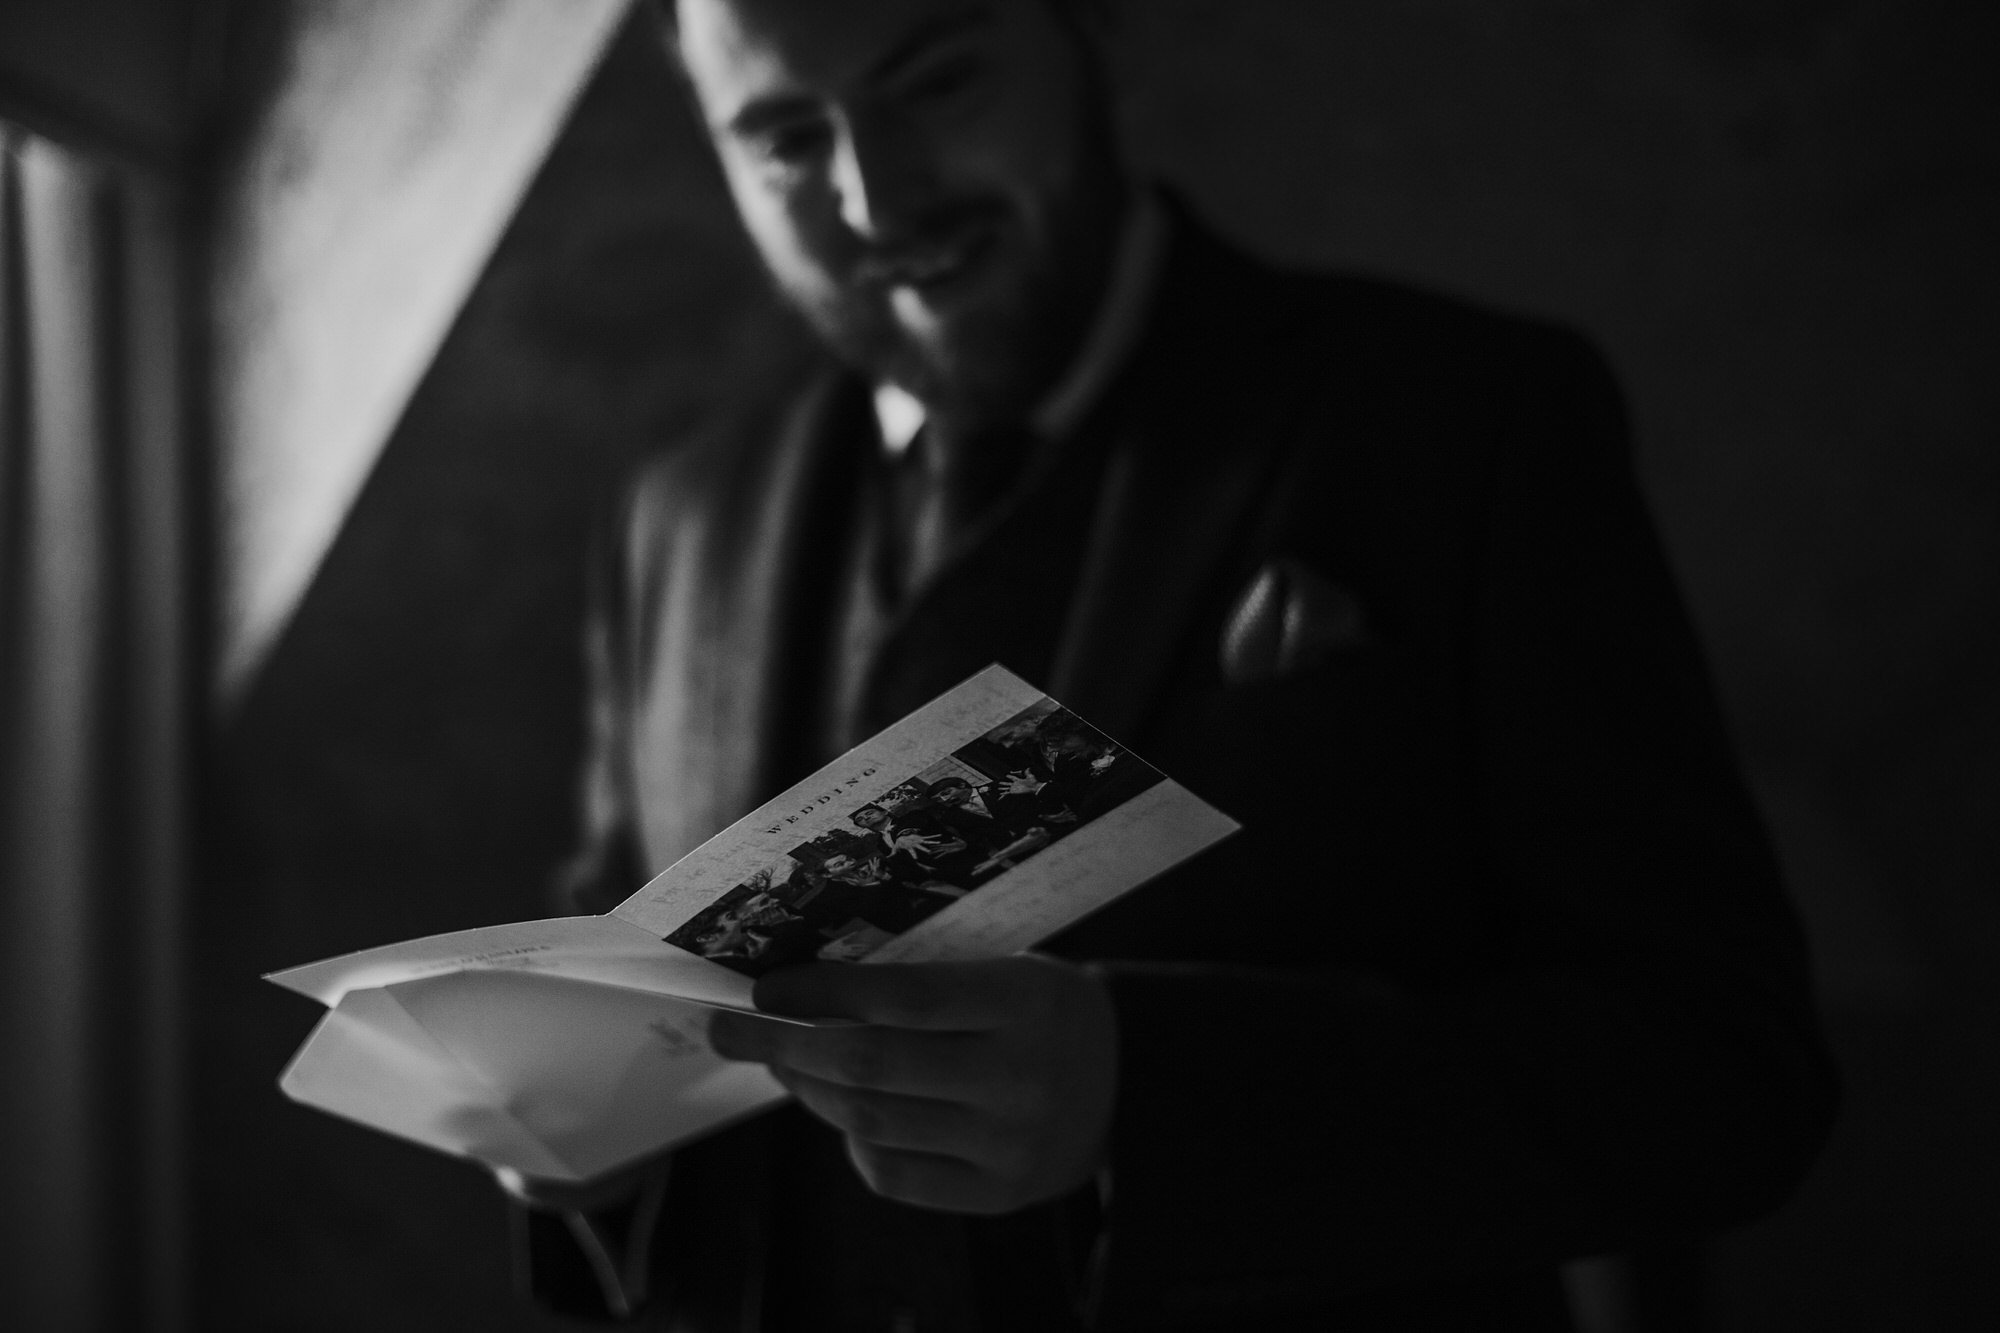 011 TIN SHED KNOCKRAICH FARM WEDDING ALTERNATIVE BRIDE ZOE ALEXANDRA PHOTOGRAPHY